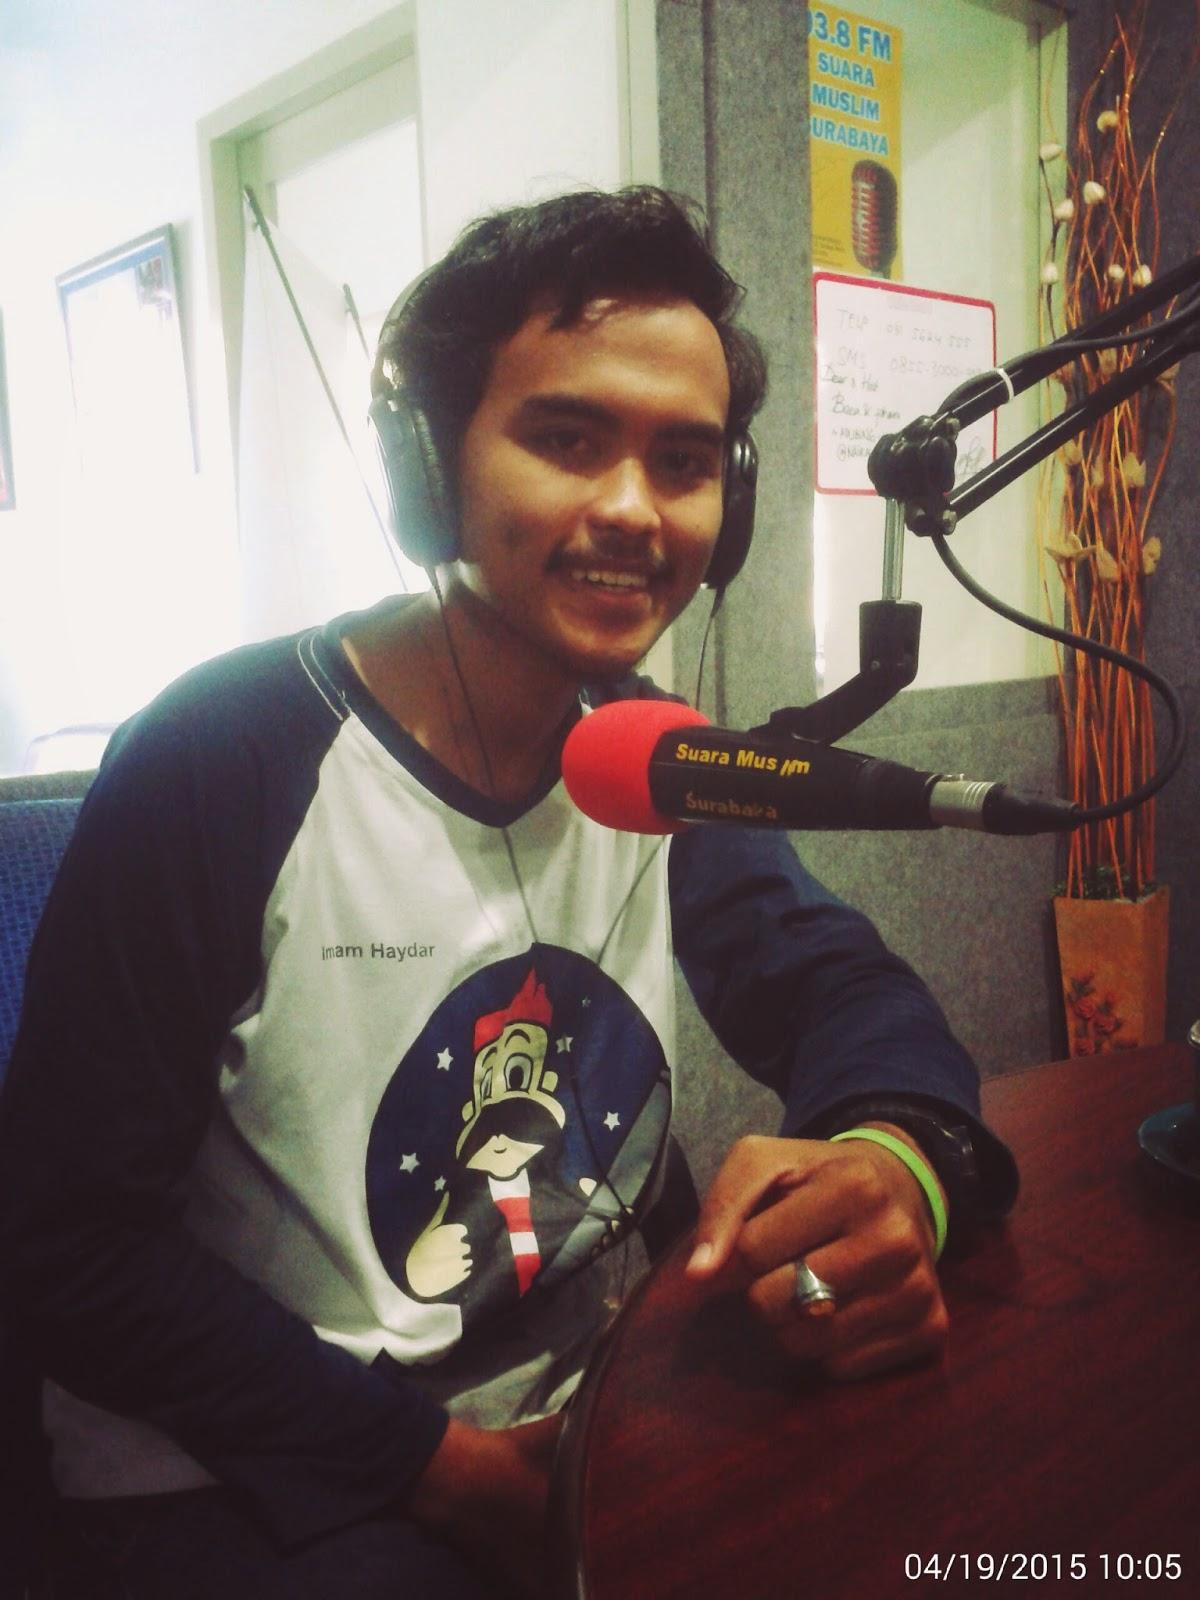 Imam Haydar siaran Radio Surabaya